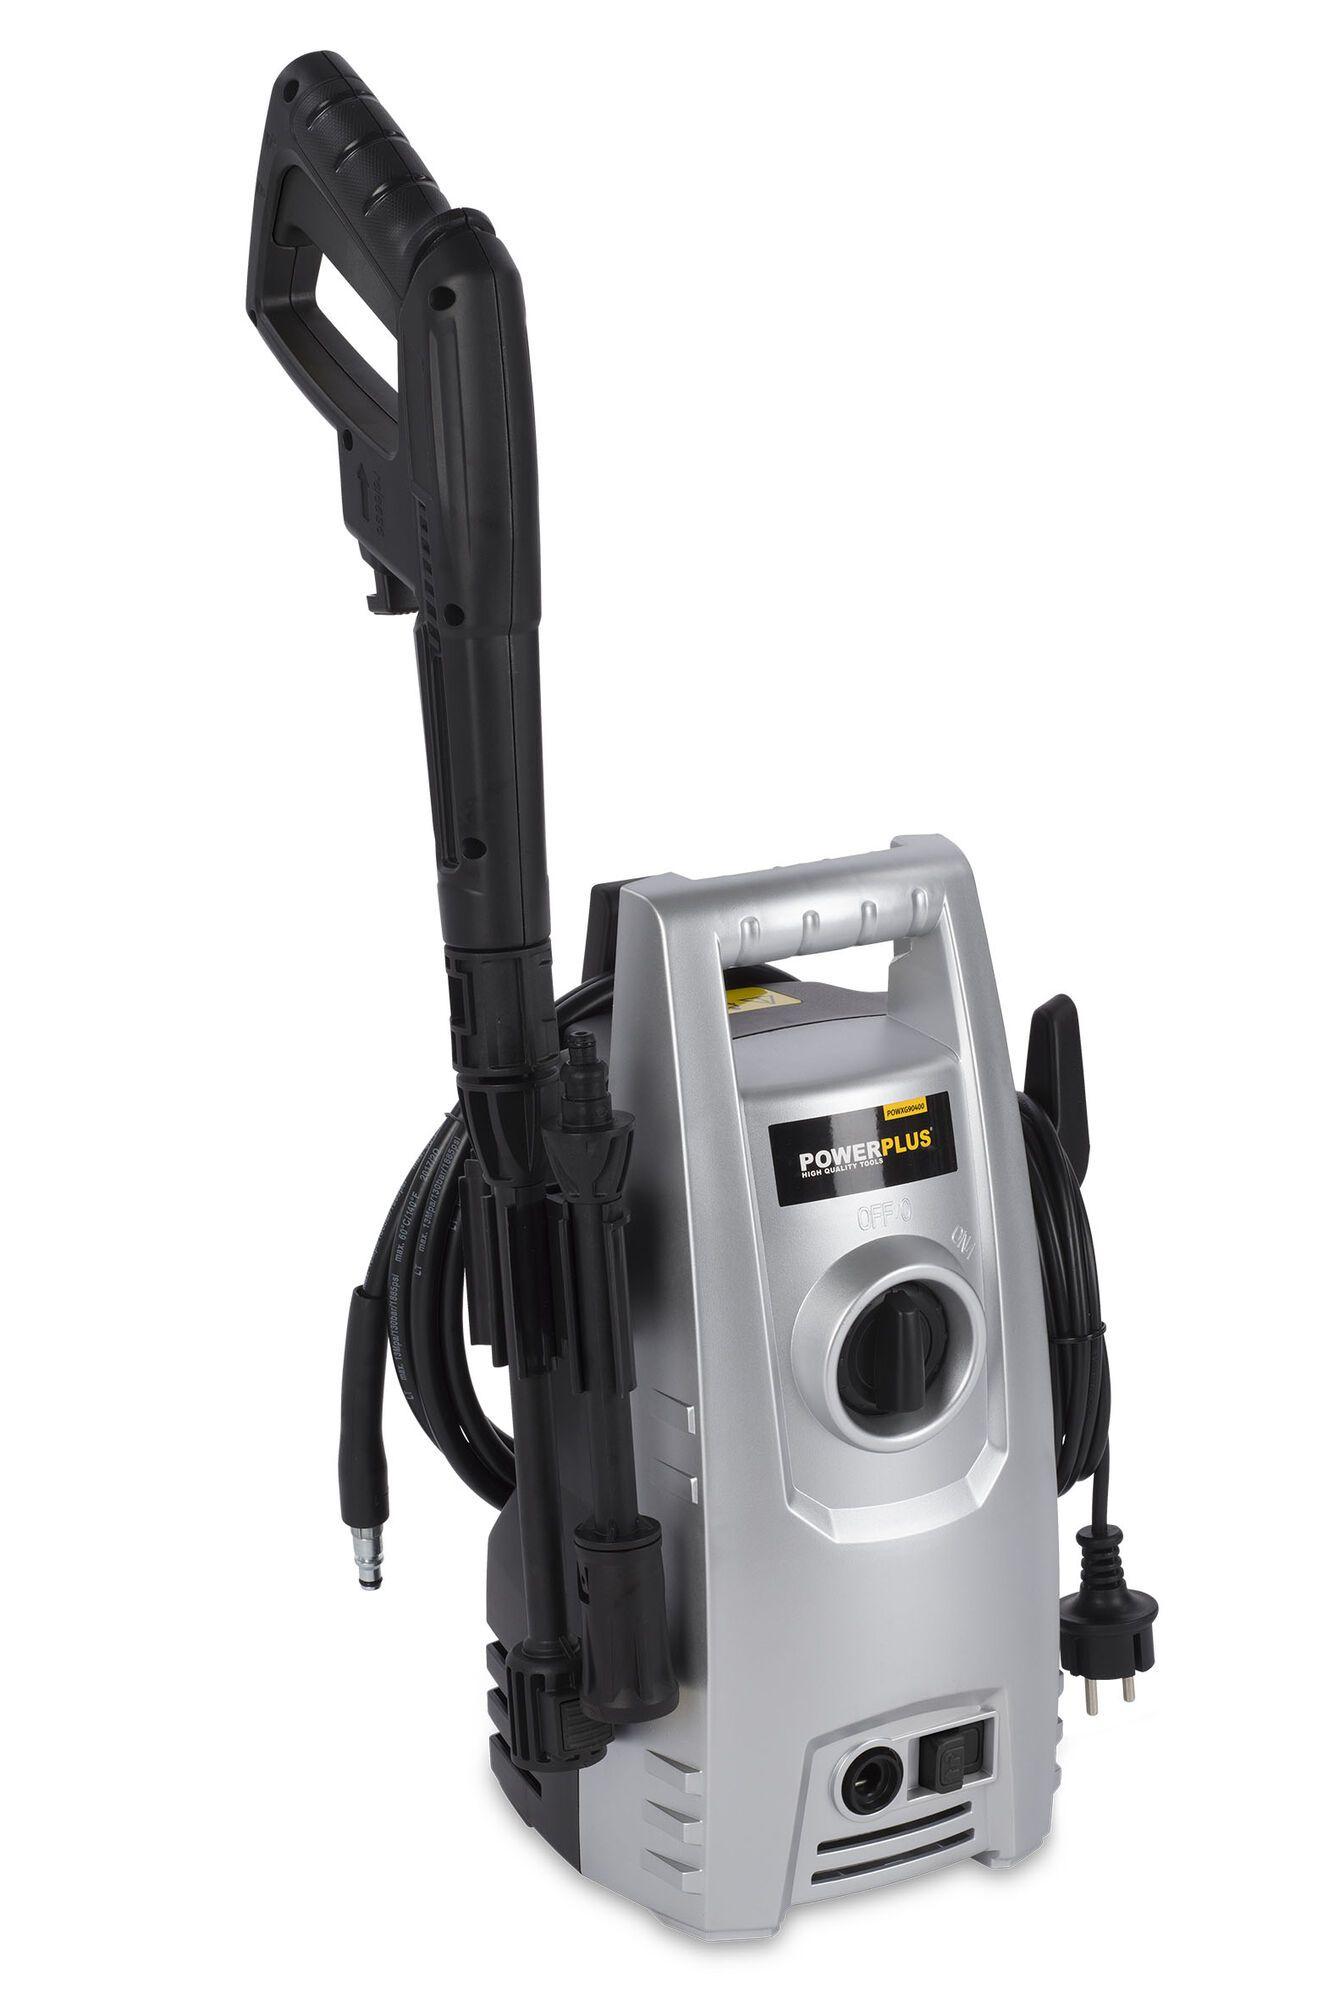 Powerplus POWXG90400 Elektrisch Hogedrukreiniger   Hogedrukspuit (hogedrukreinigers elektrisch)